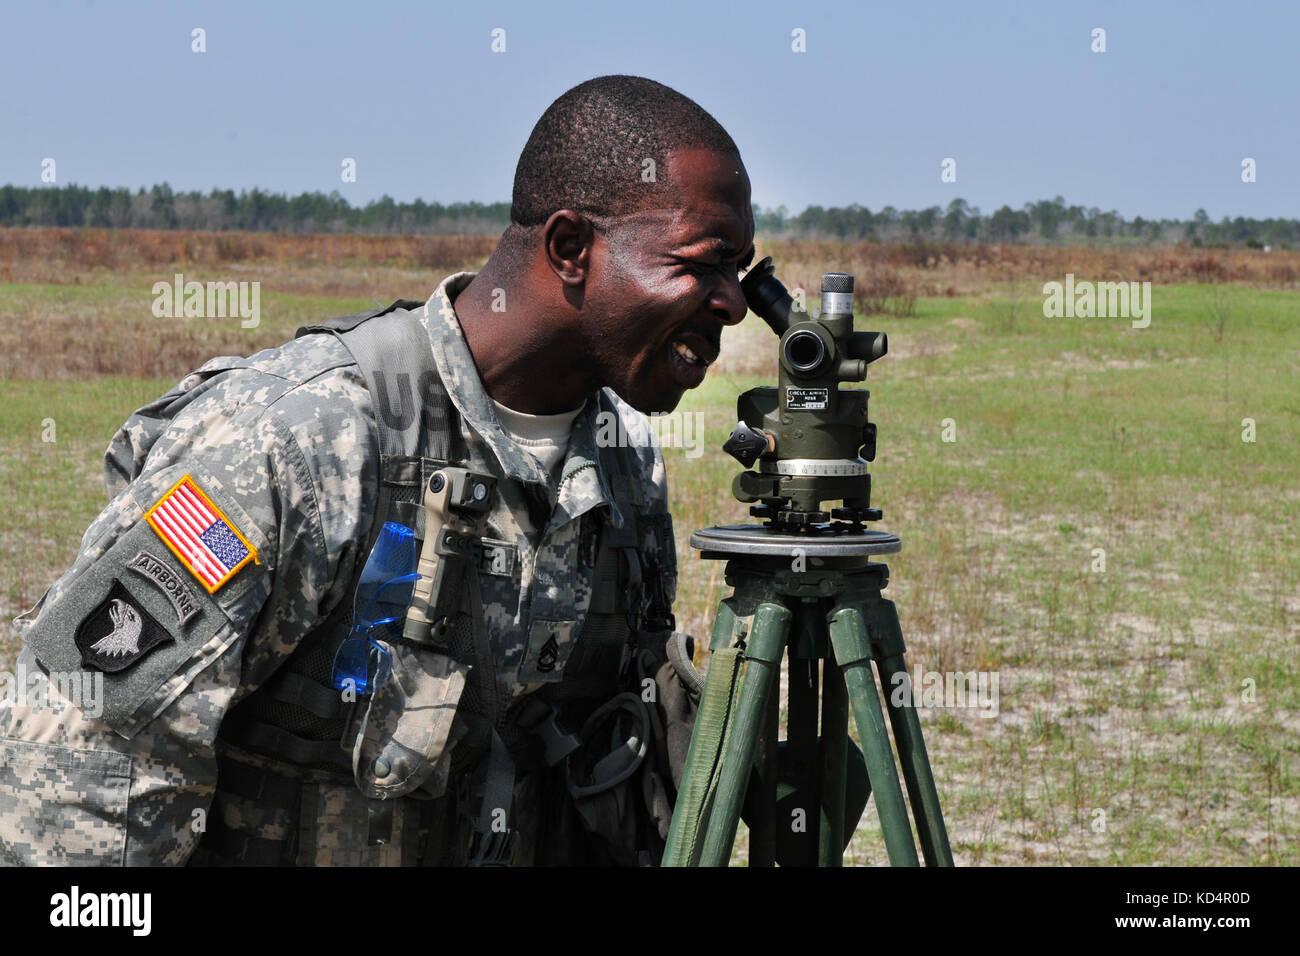 178th field artillery south carolina army national guard conducts rh alamy com Field Artillery Support Plan Example Field Artillery Gunnery